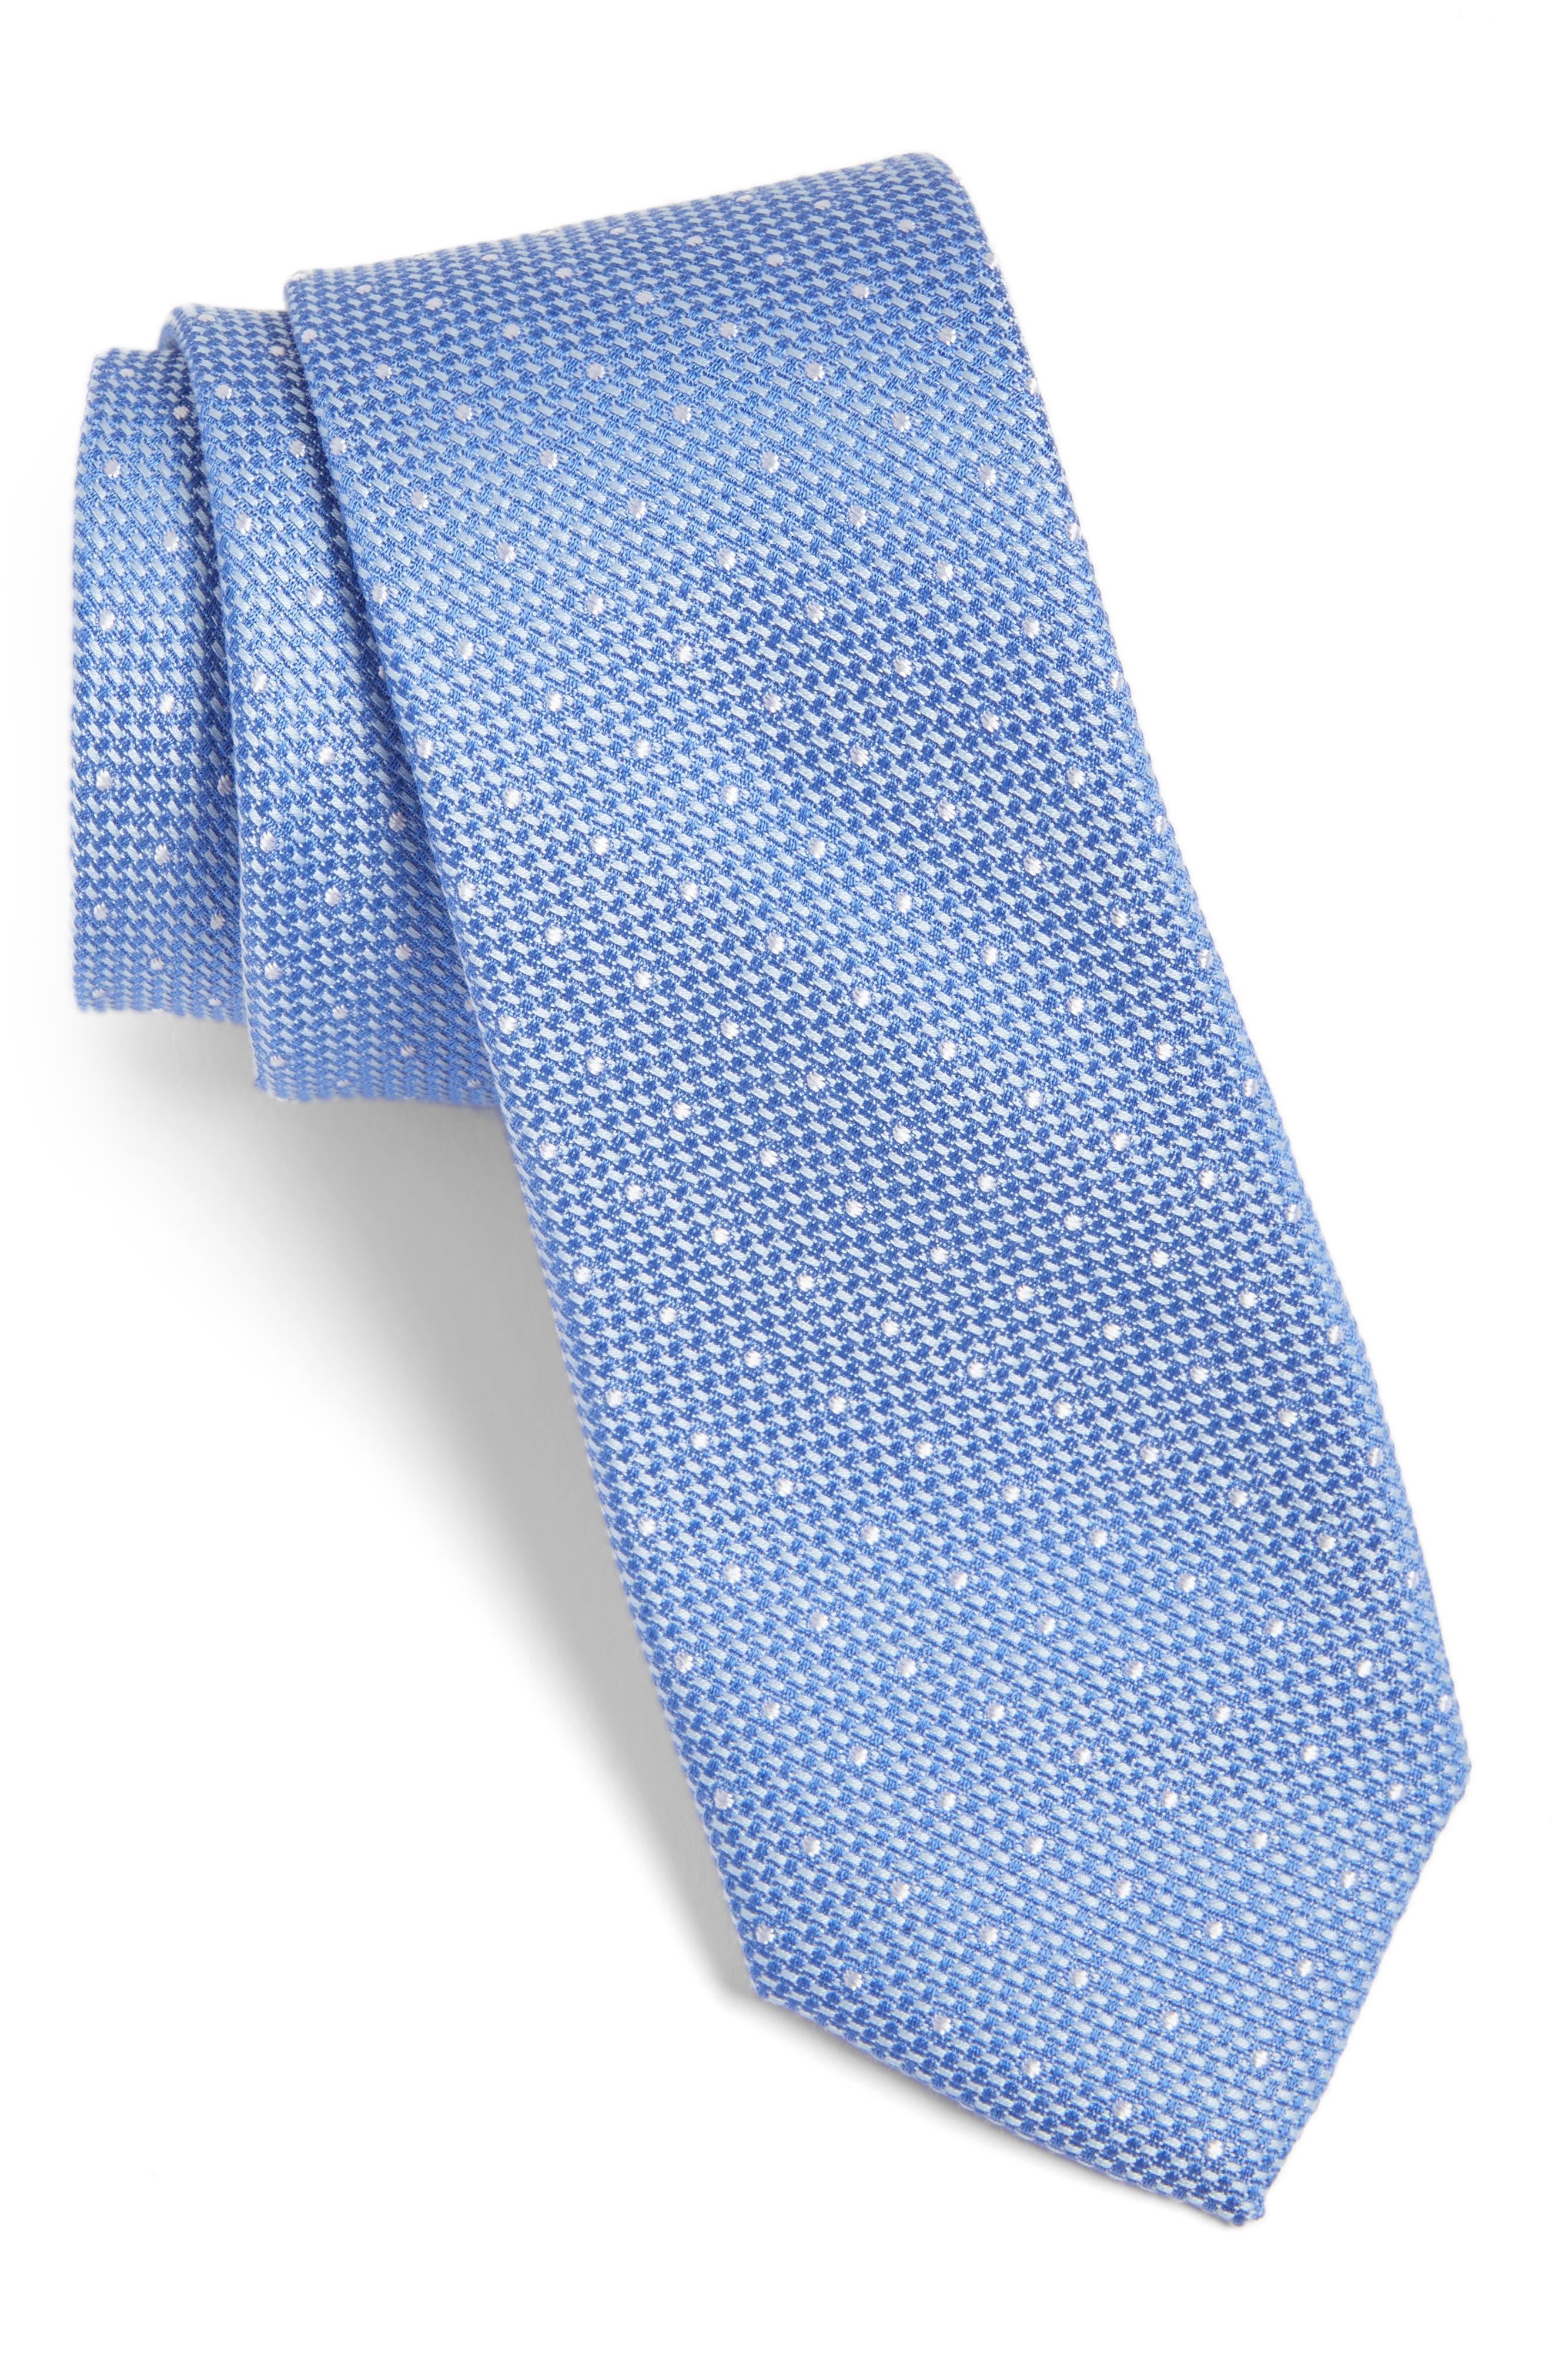 Main Image - Calibrate Dot Cotton & Silk Tie